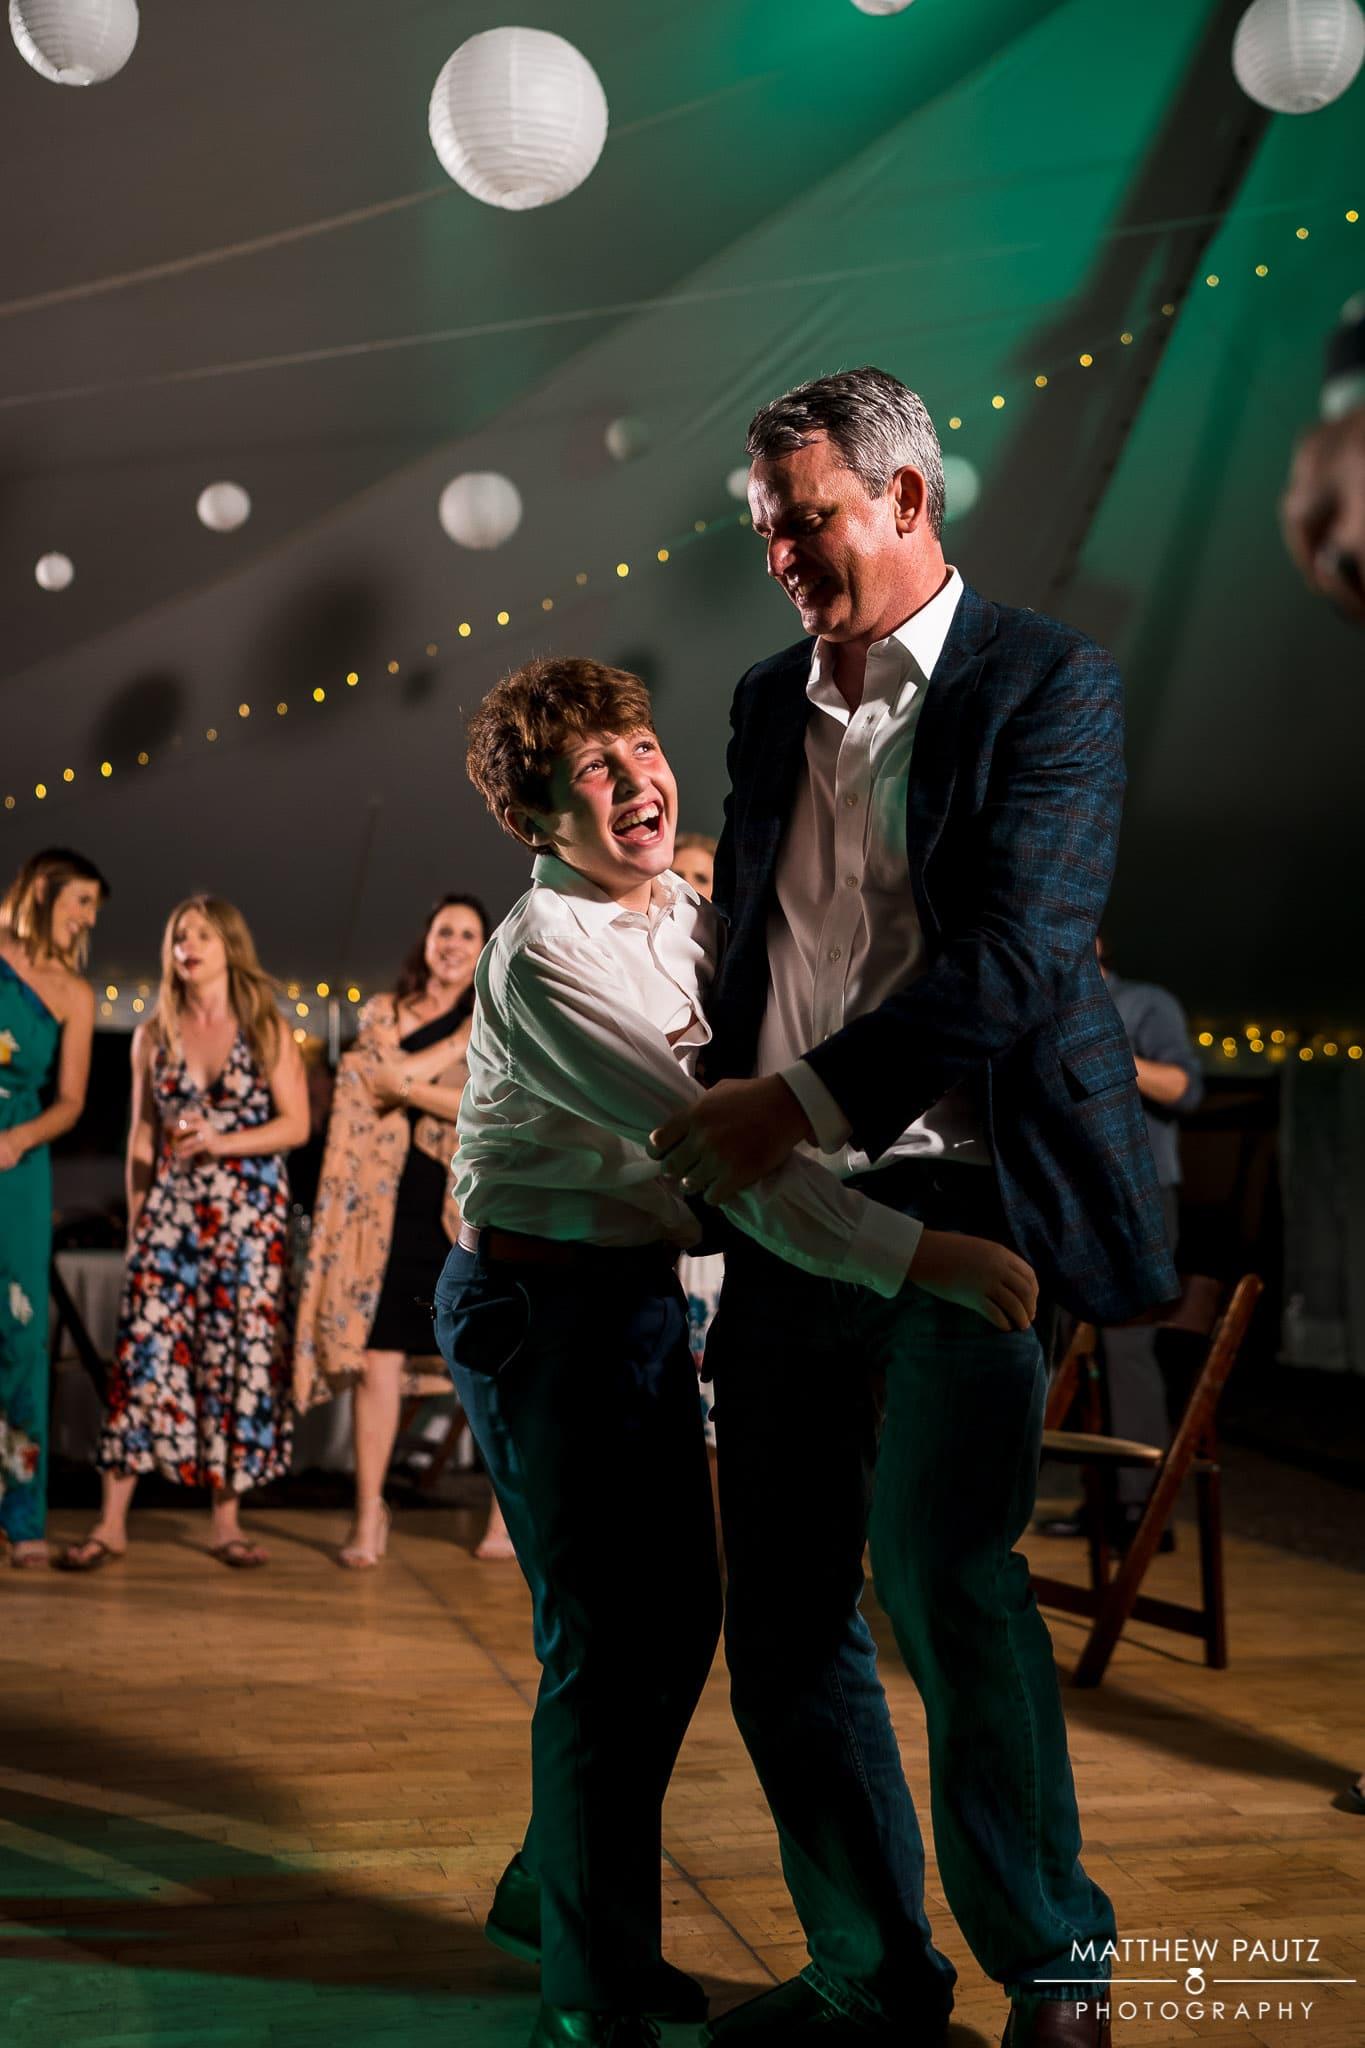 dancing wedding guests at asheville wedding reception